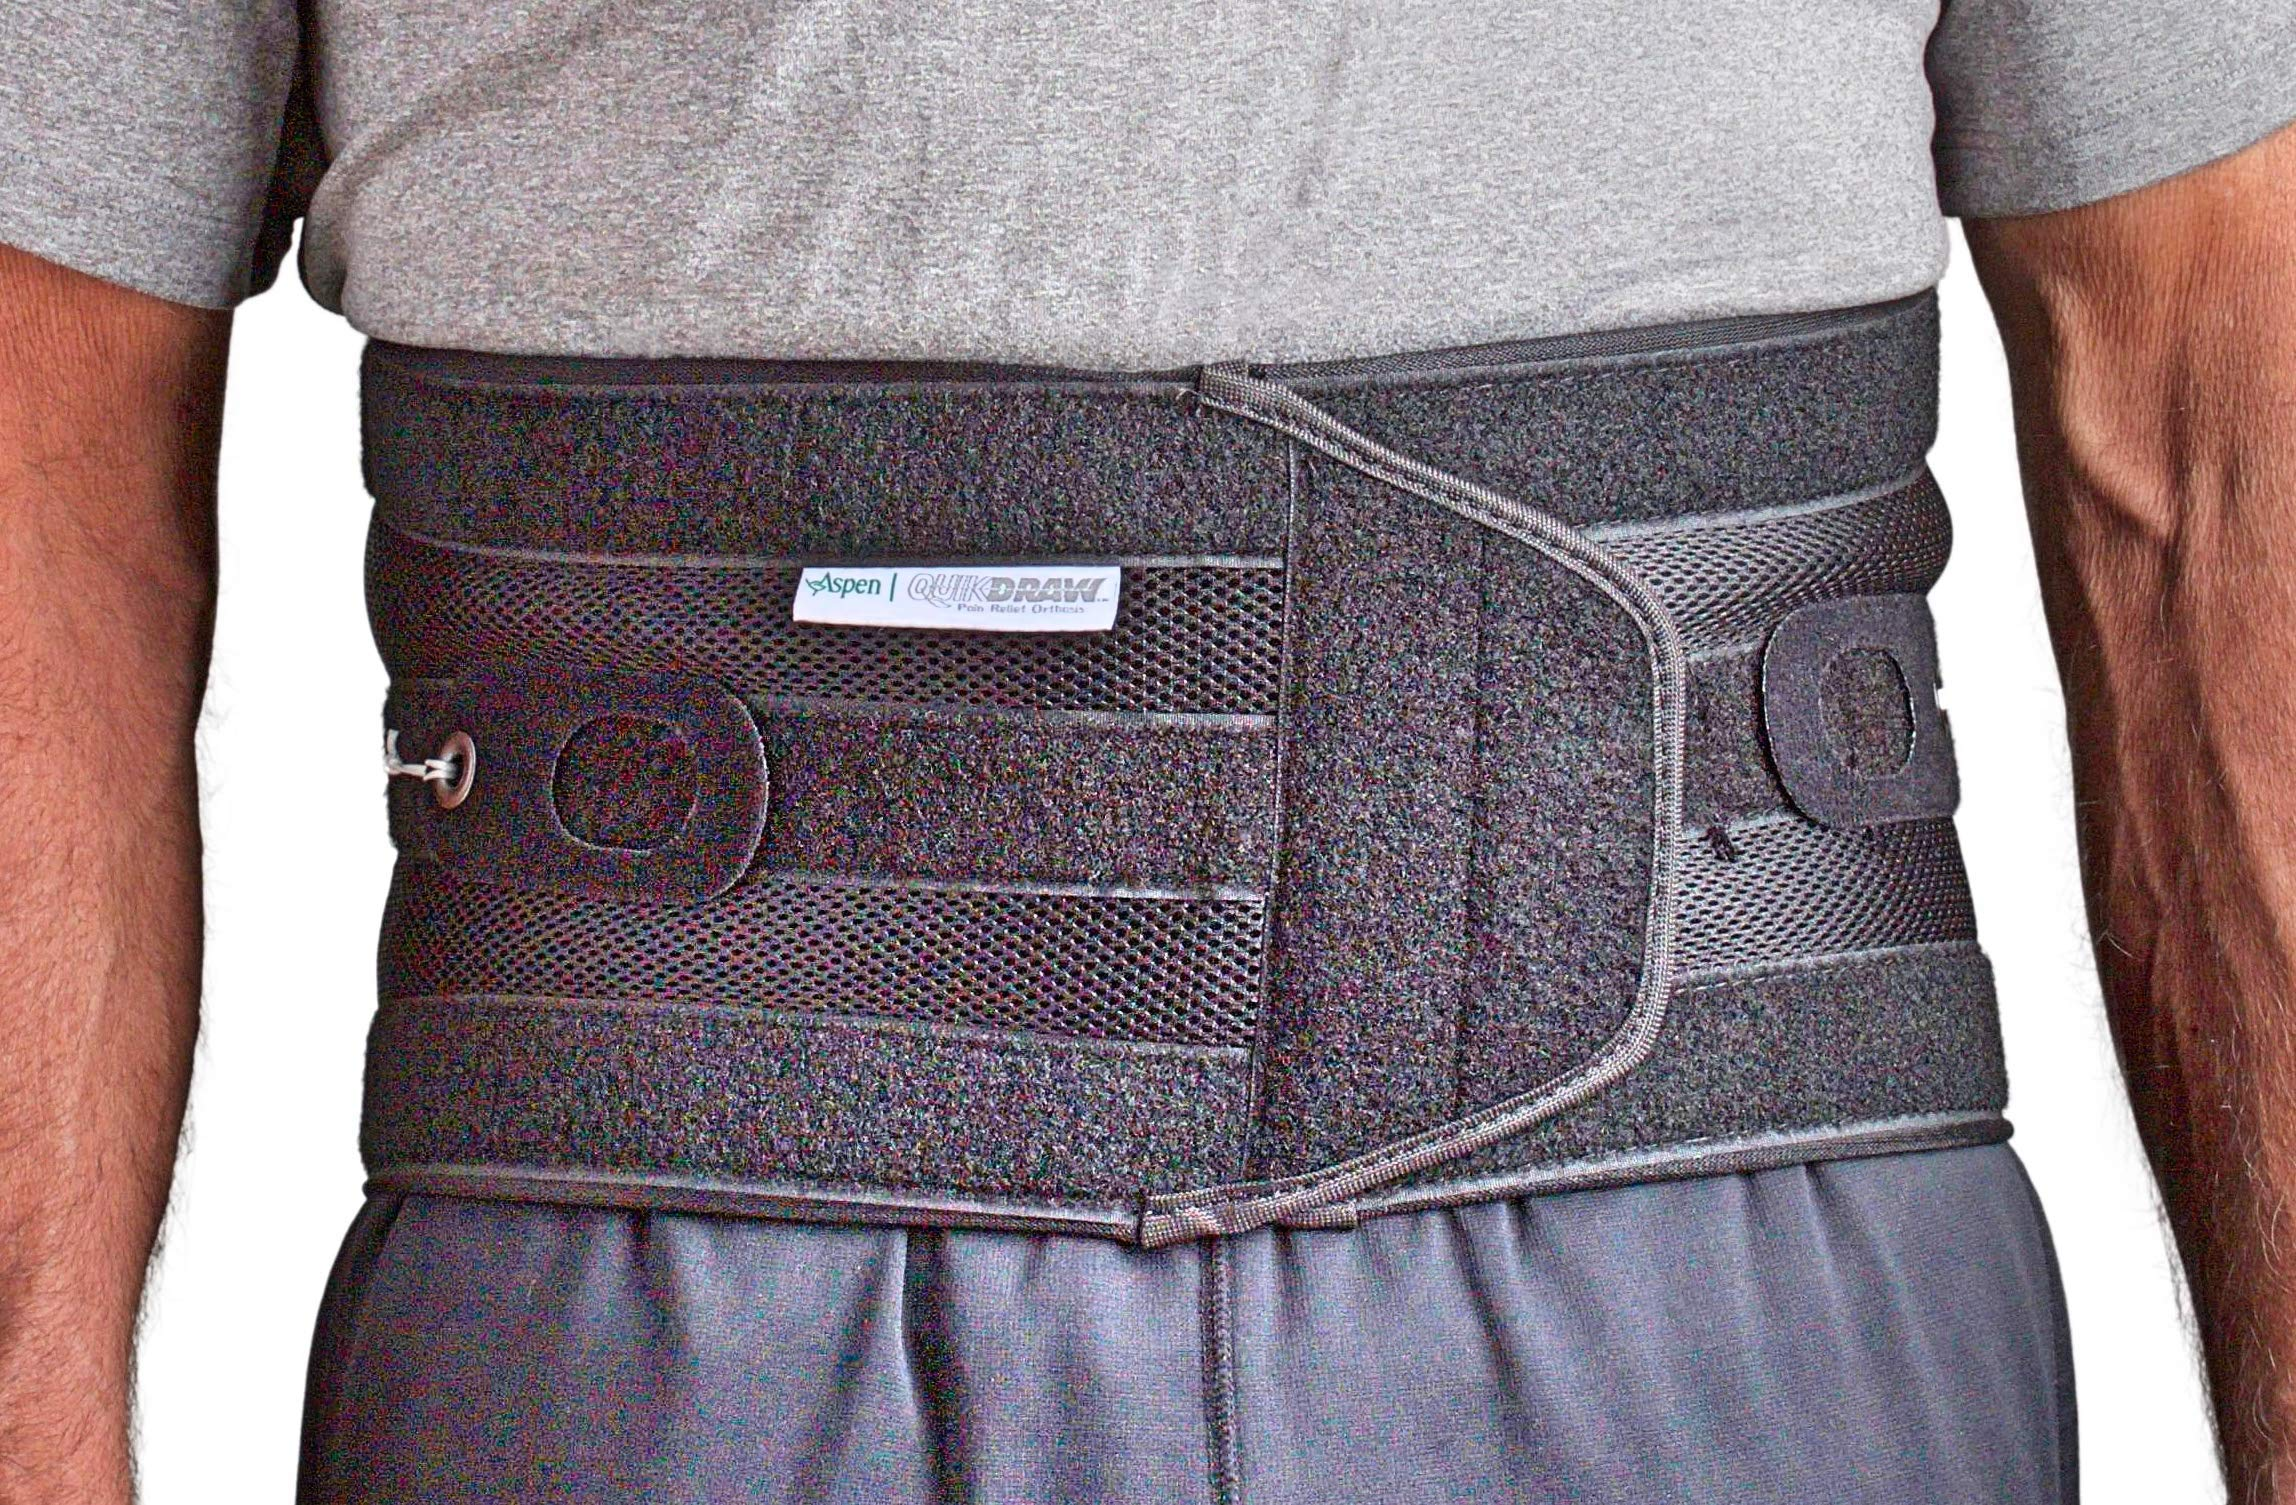 Aspen Quikdraw PRO Back Brace, Back Braces for Lower Back Pain Women & Men fits Belly (NOT Waist) Size 31''-37'', Lumbar Back Brace, Back Support Belt for Men, Lumbar Support Belt (Black, Medium)